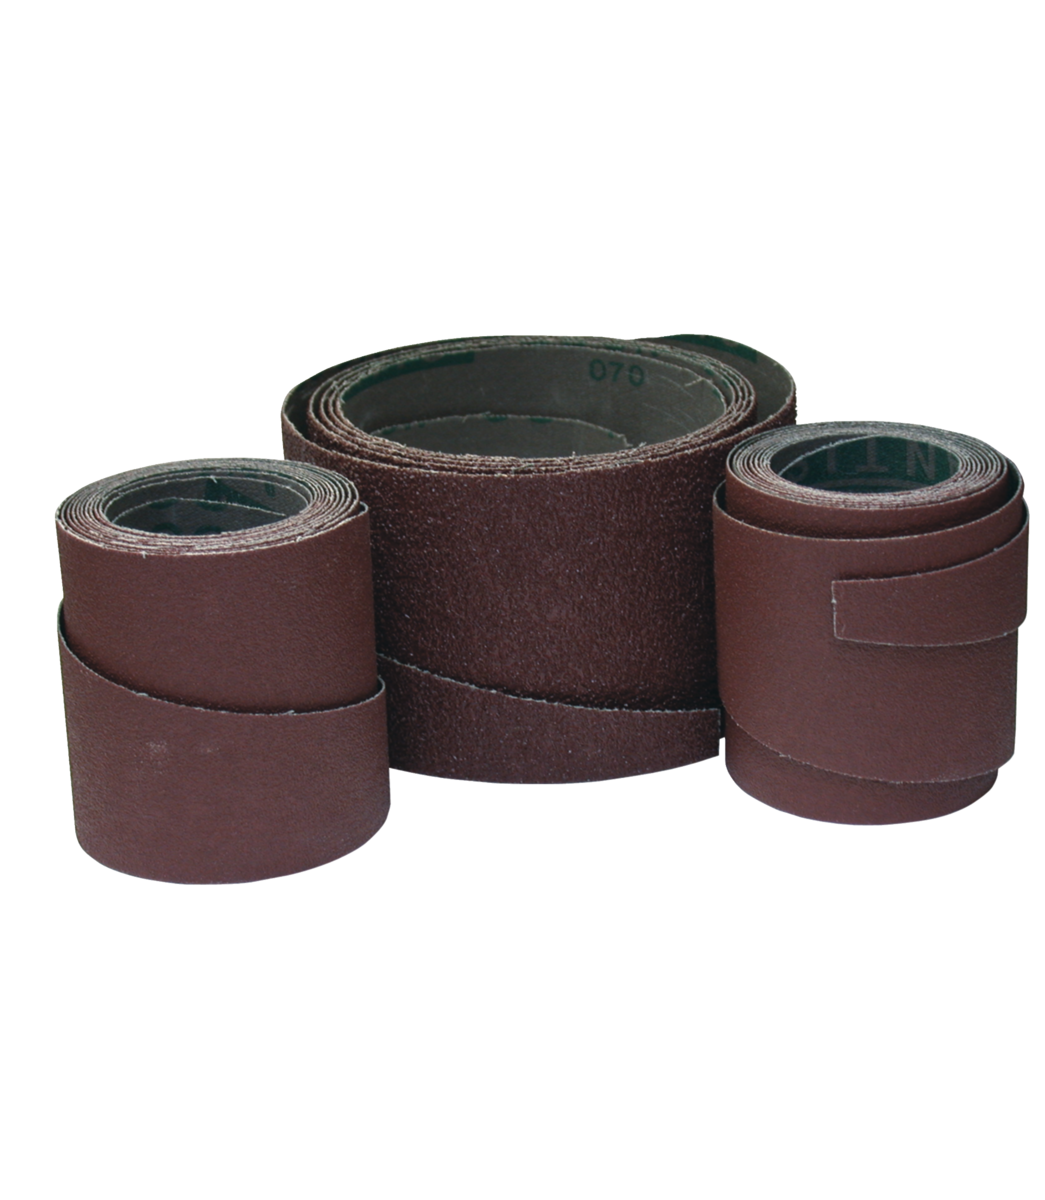 PM2244 Precut Abrasive, 100 Grit - 3 Pack